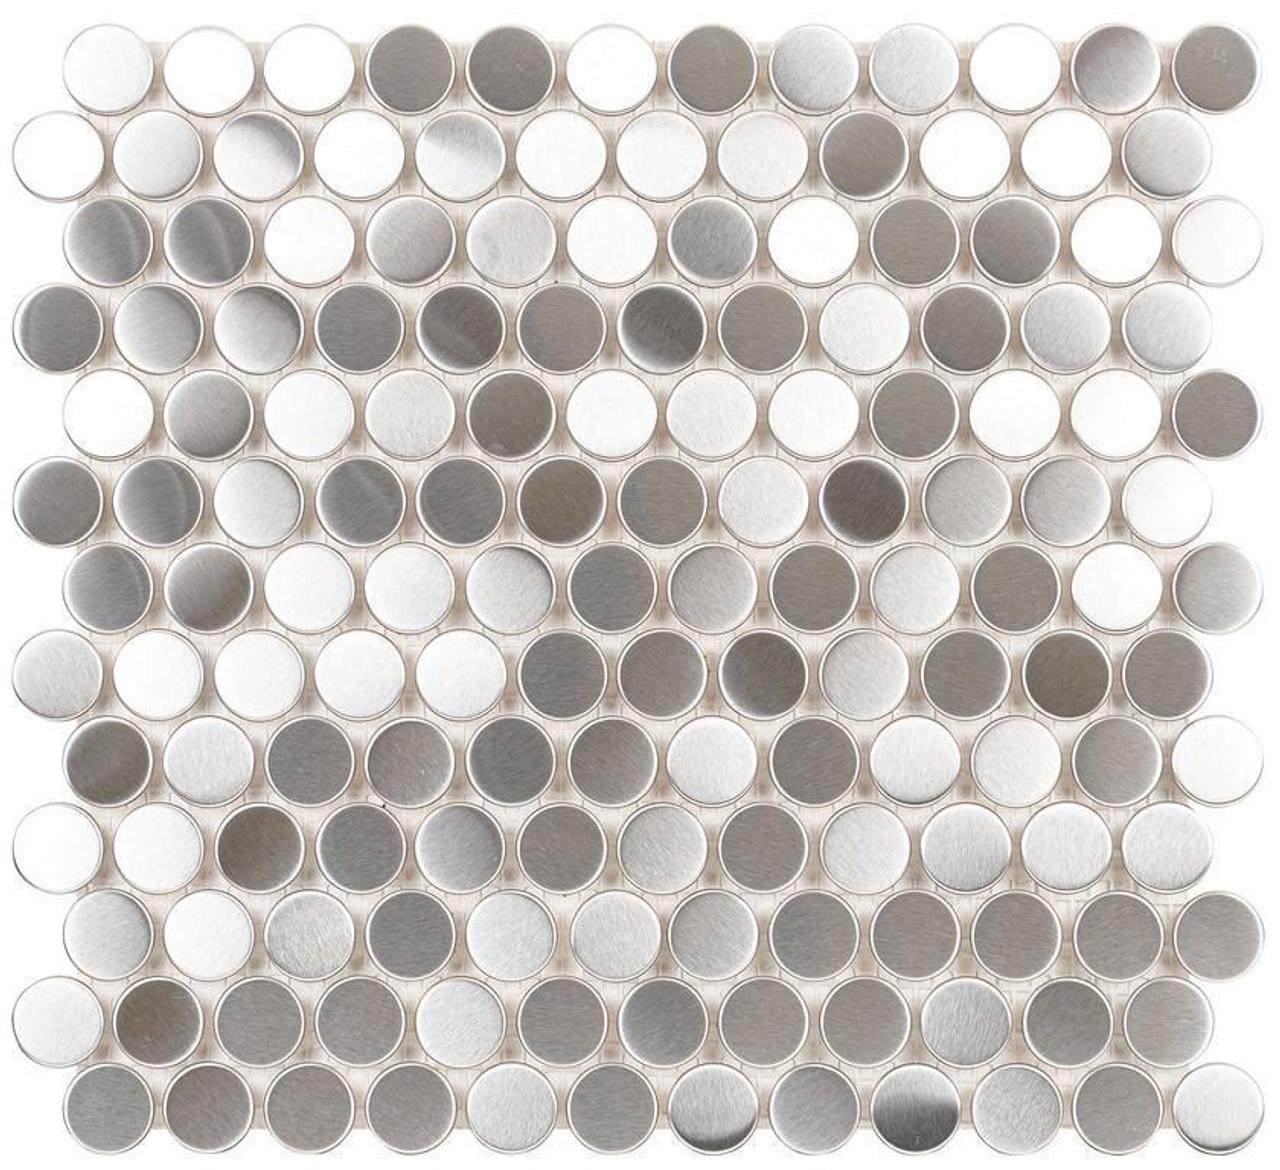 UBC Stainless Steel Tile Backsplash Nickel Mosaic 411-016